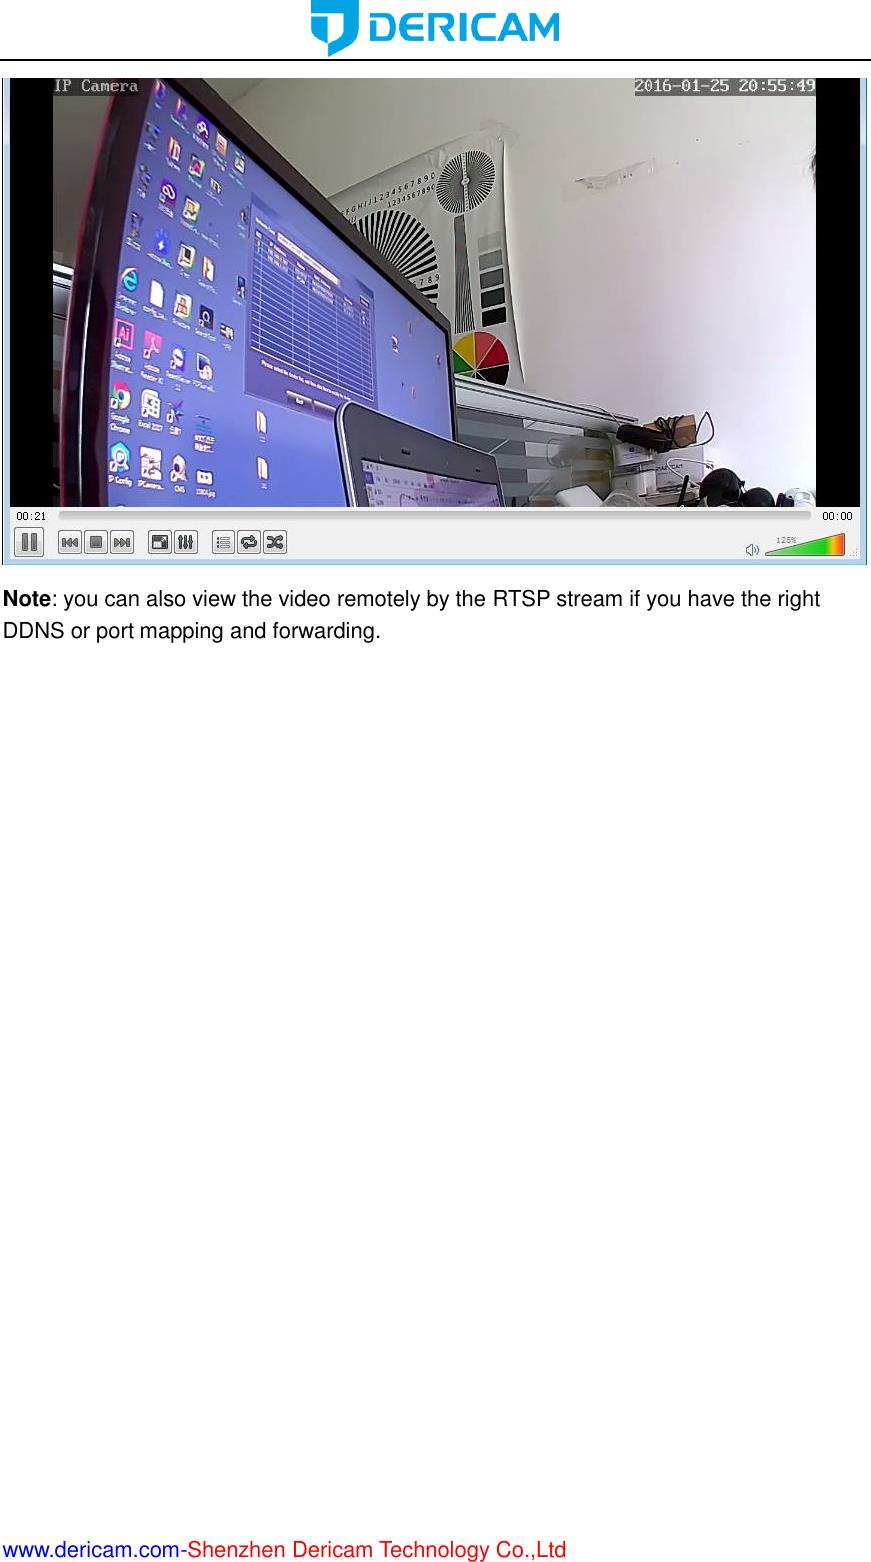 Dericam Technology S1 IP Camera User Manual